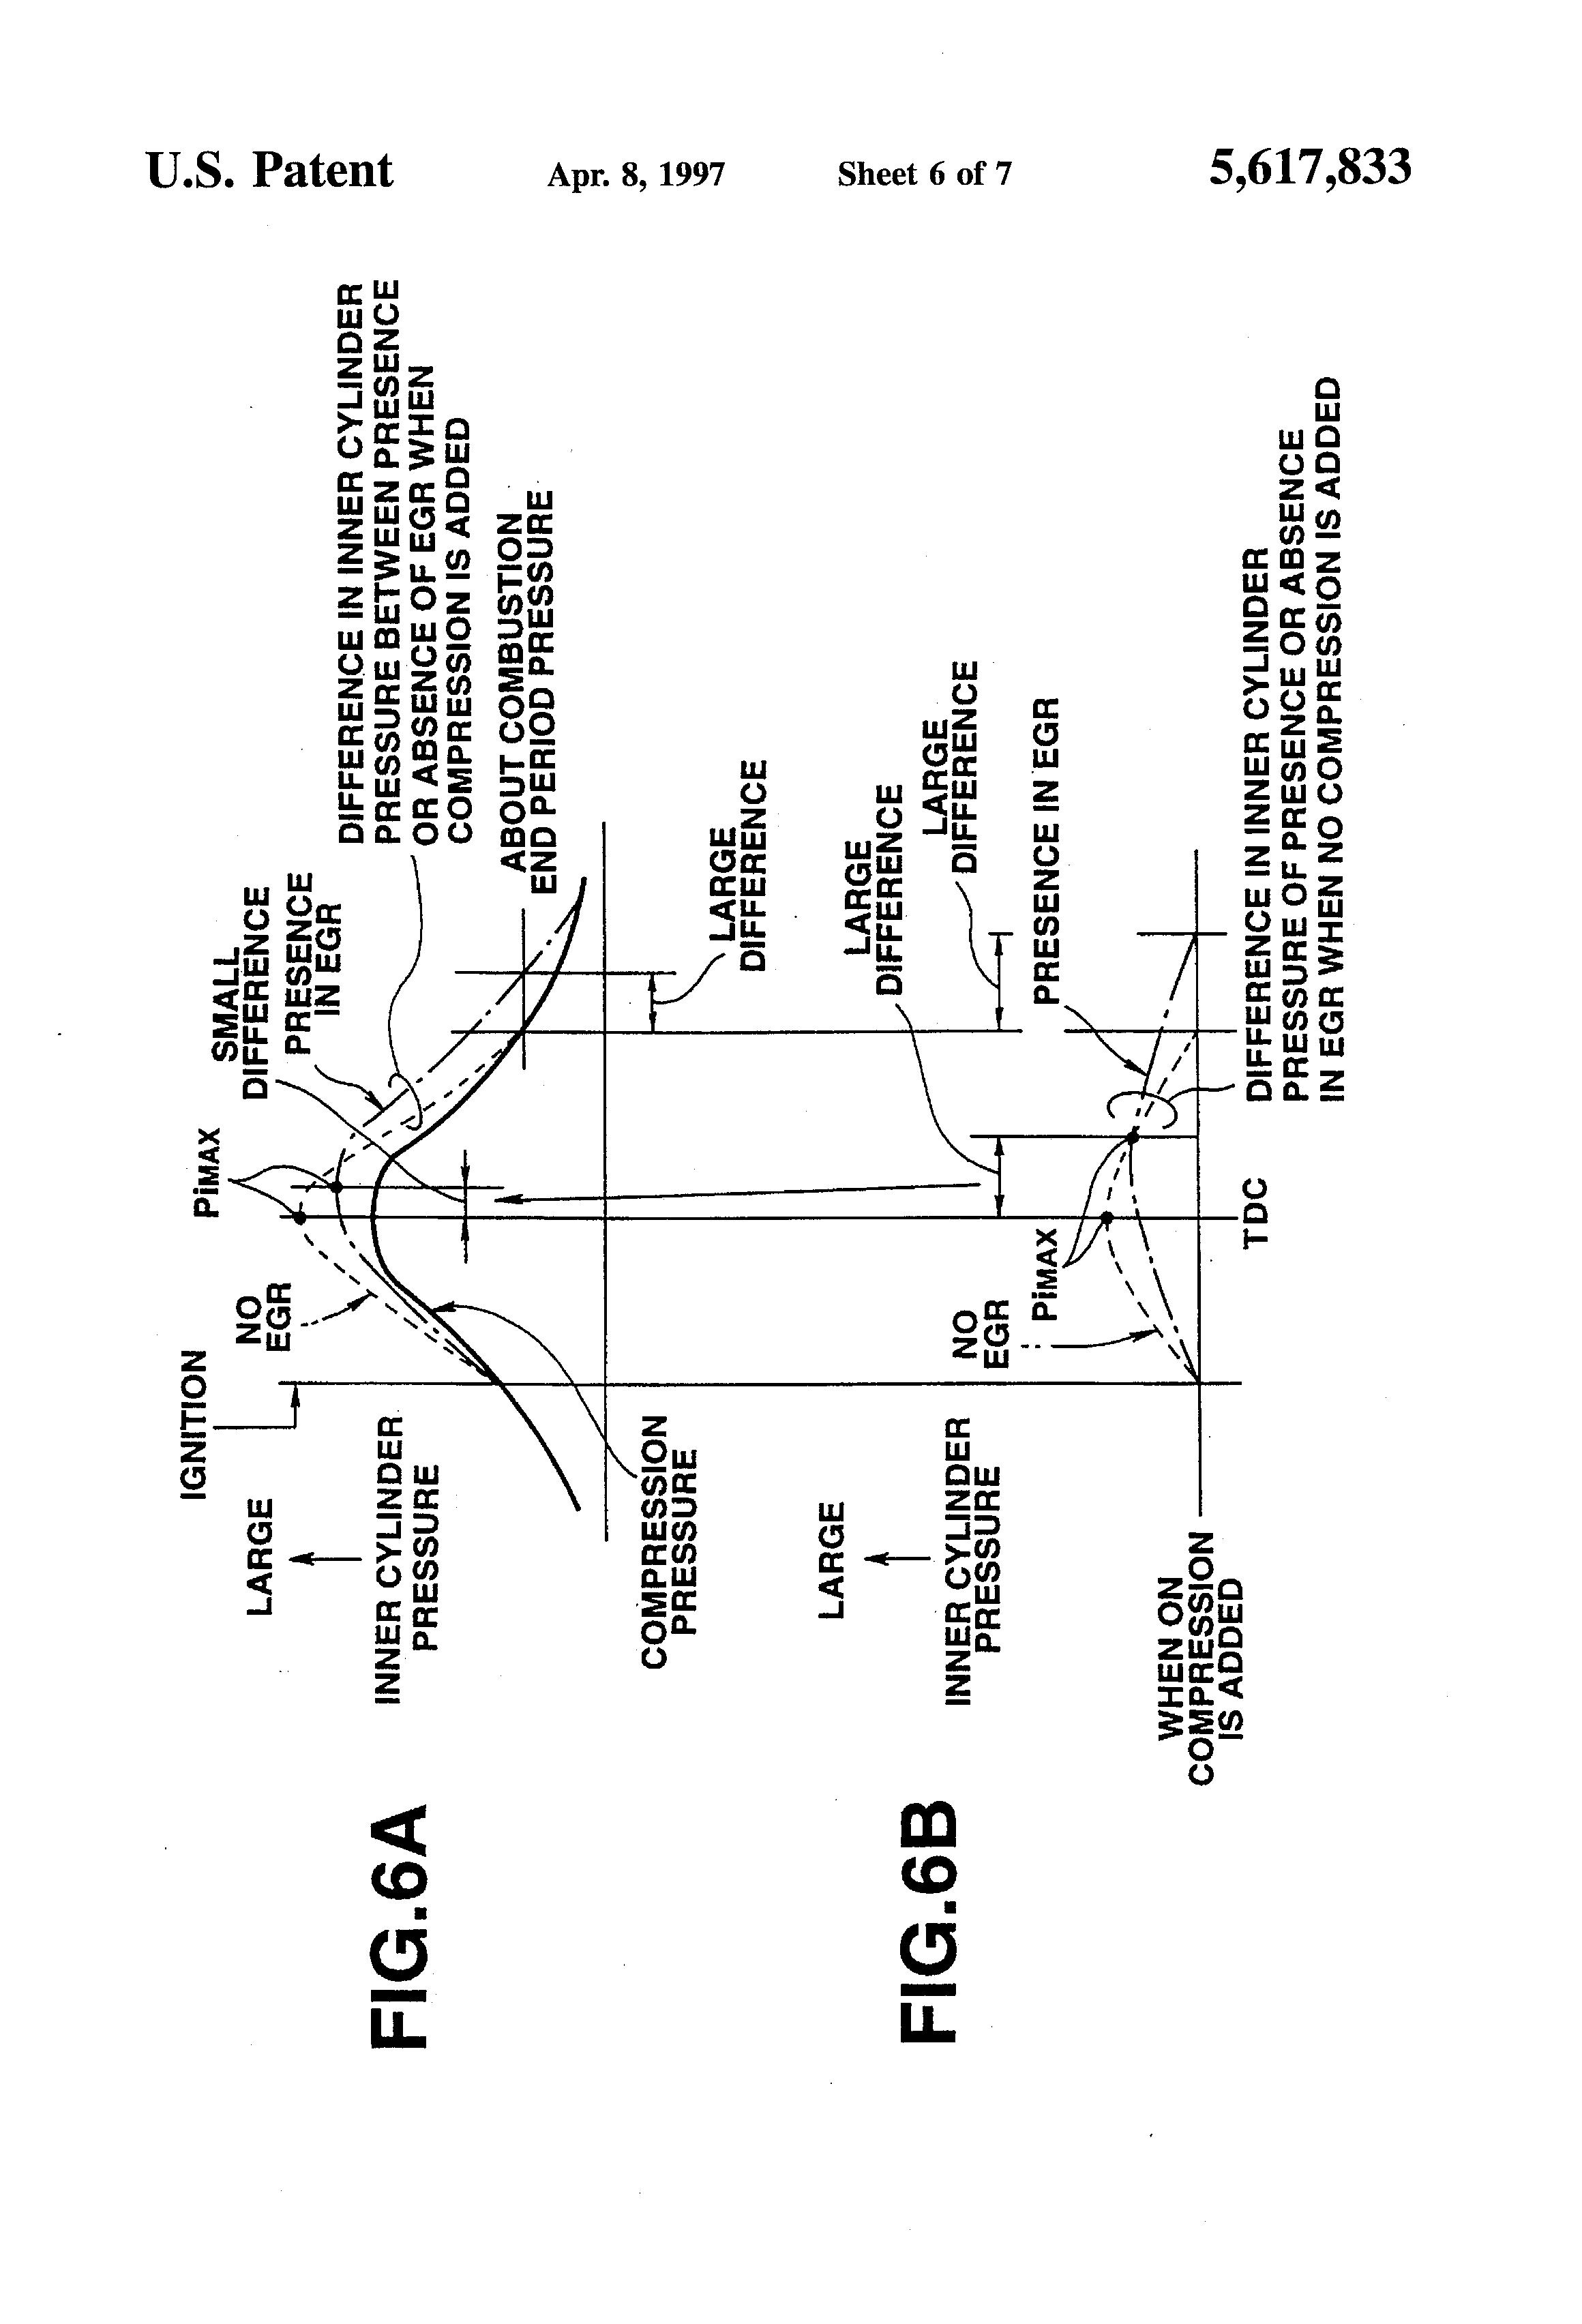 6b combustion engine diagram schematics wiring diagrams u2022 rh seniorlivinguniversity co Four Cycle Engine Diagram Motorcycle Basic Engine Diagram